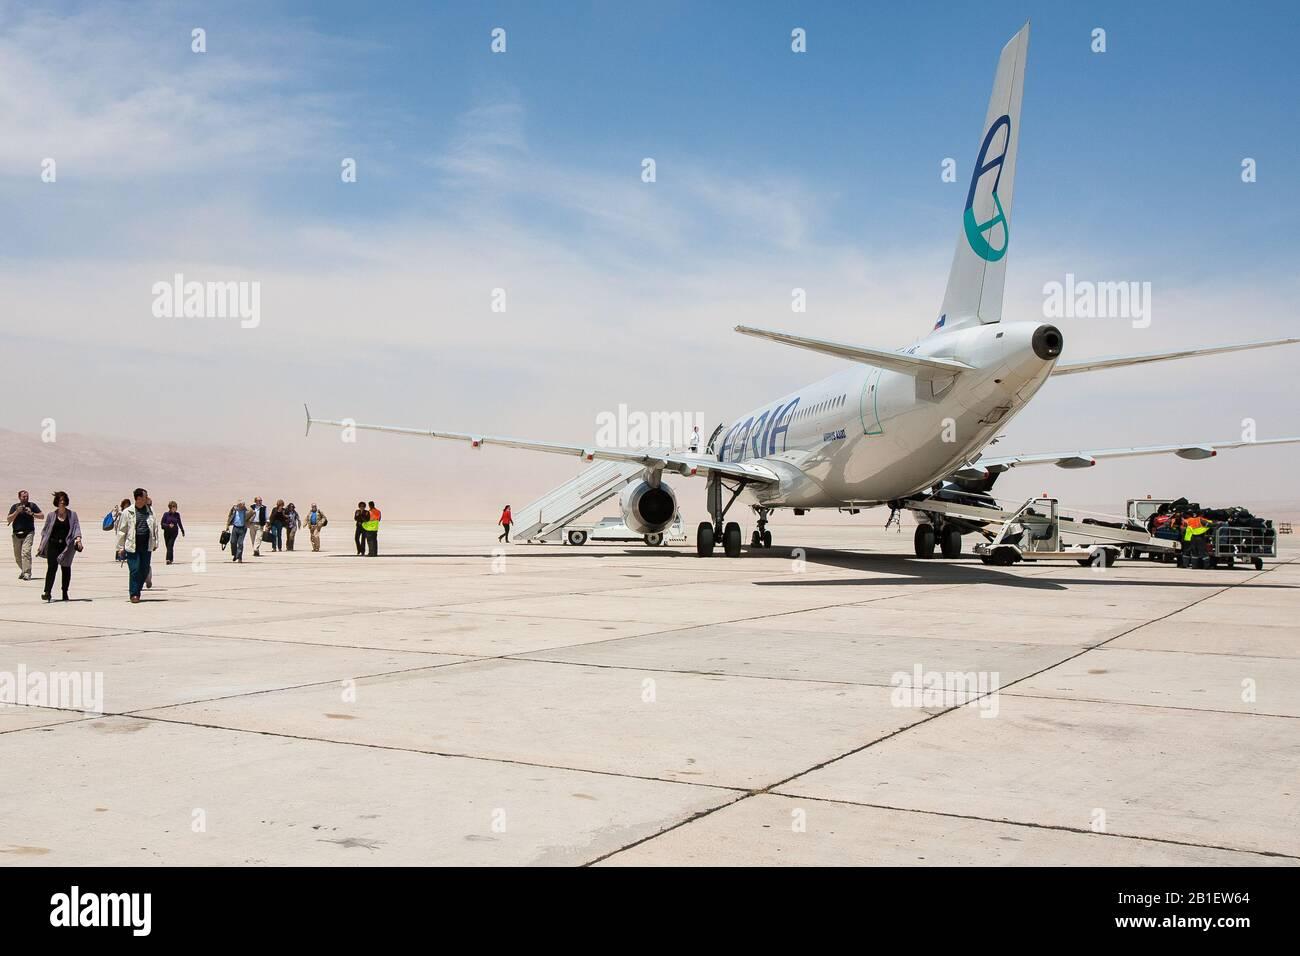 Aqaba, Jordan, April 27, 2009: A Slovenian Adria Airways airplane sits on the tarmac of the King Hussein International Airport in Aqaba, Jordan. Stock Photo